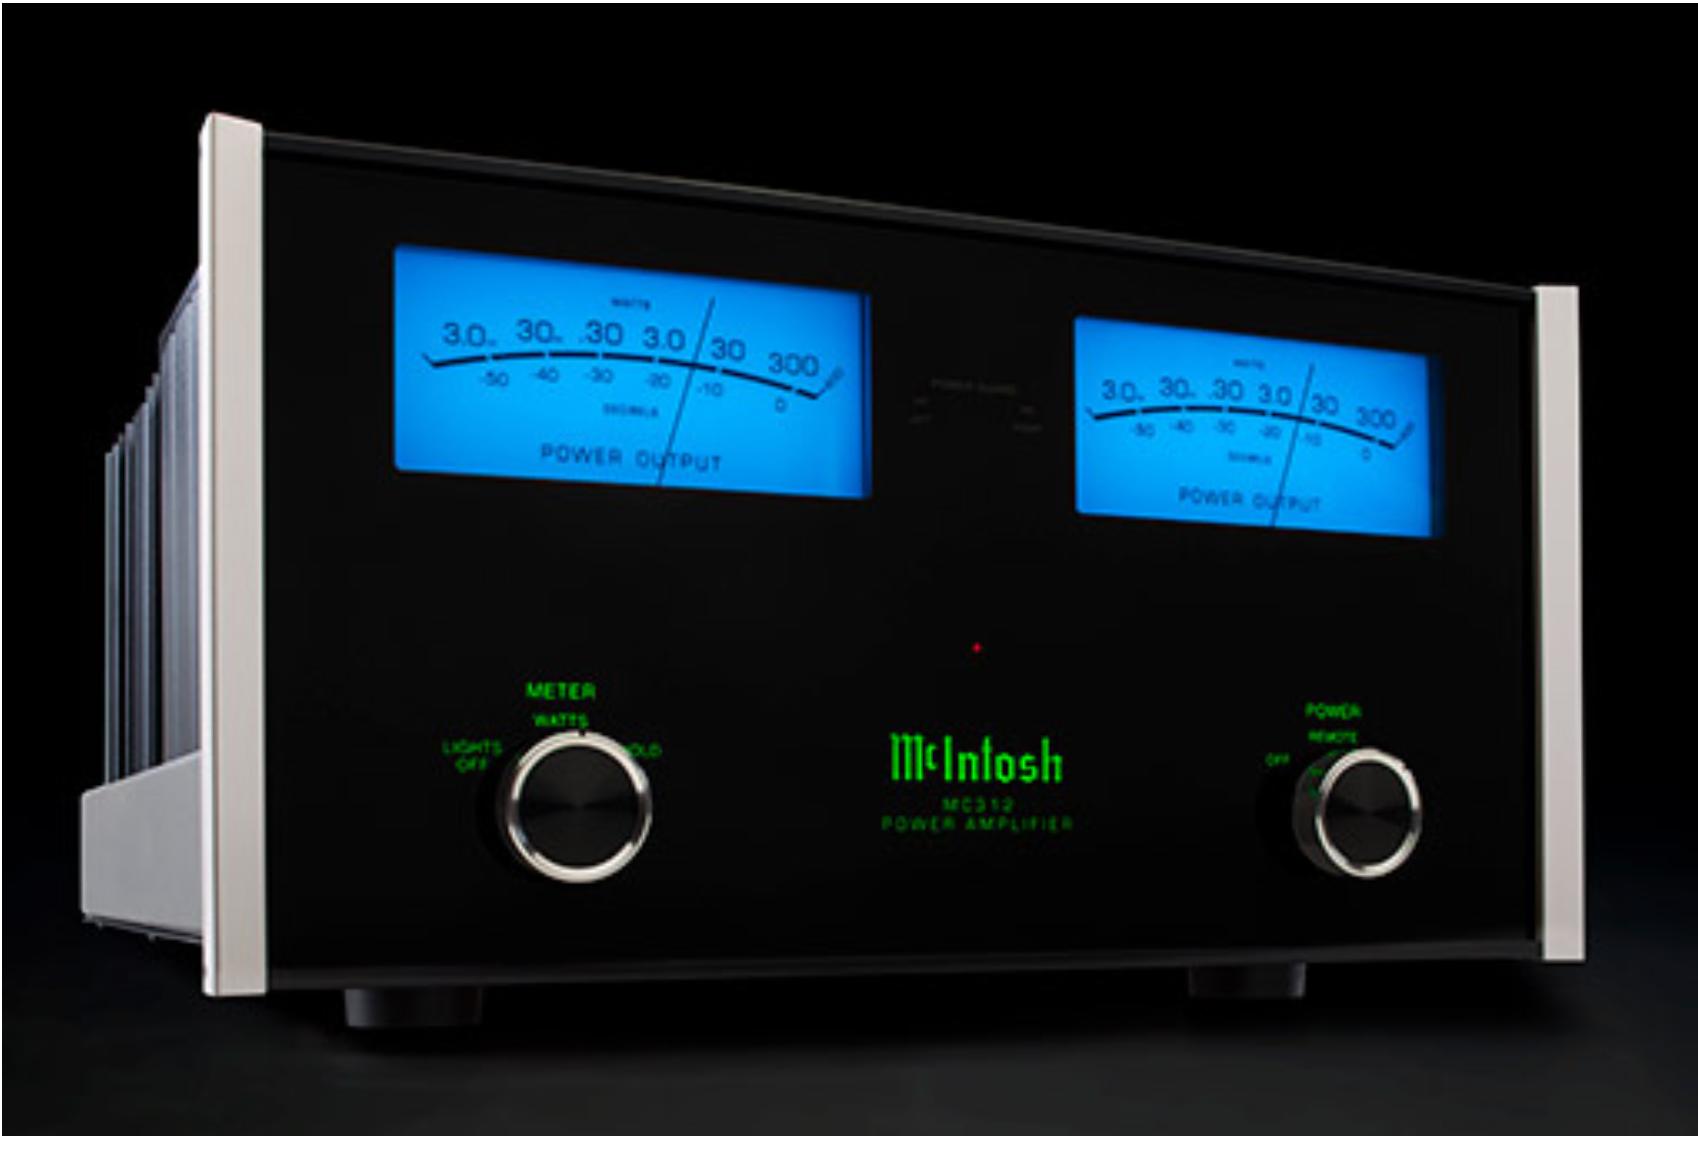 McIntosh, power amplifier